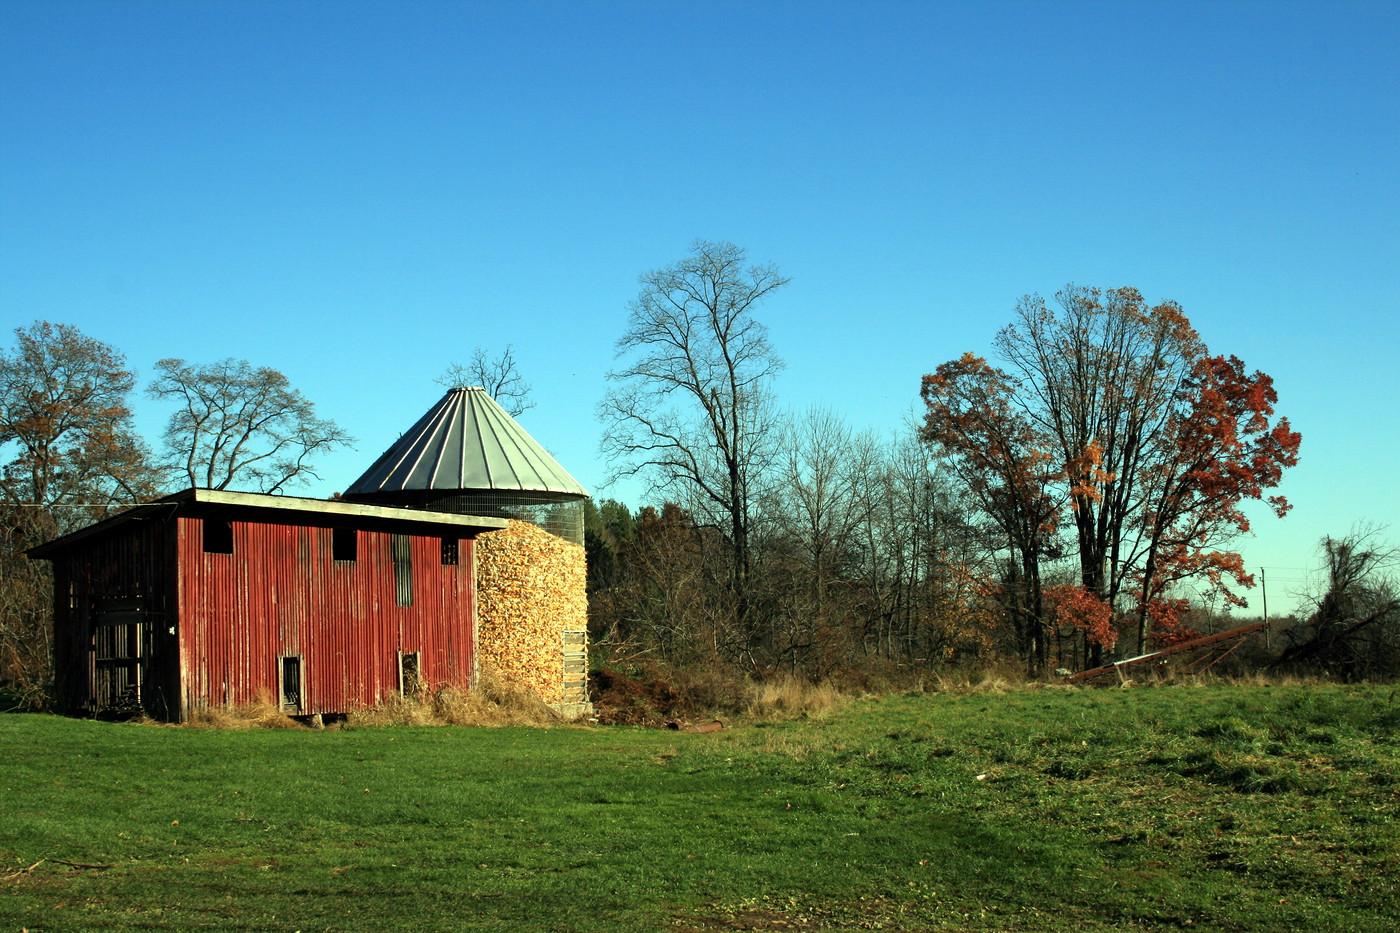 Pennsylvania Farmers Corn Crib